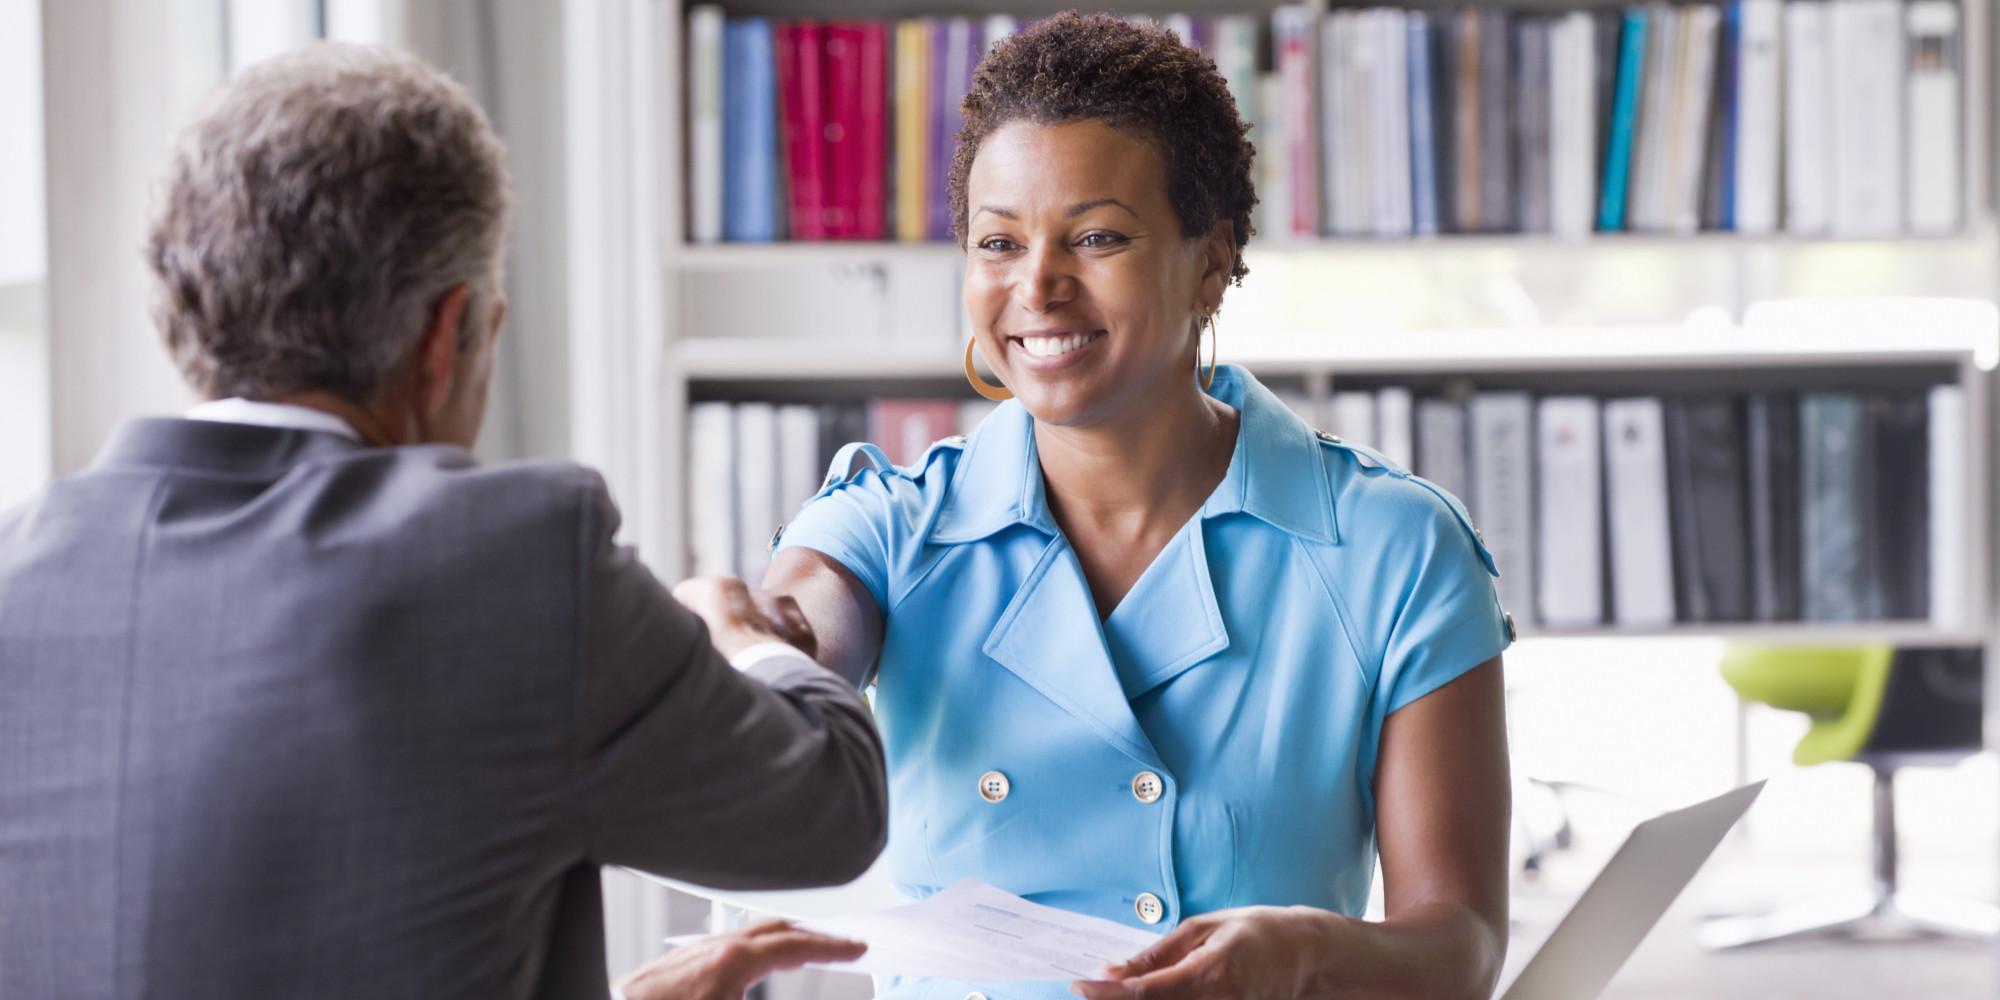 executive interview tips